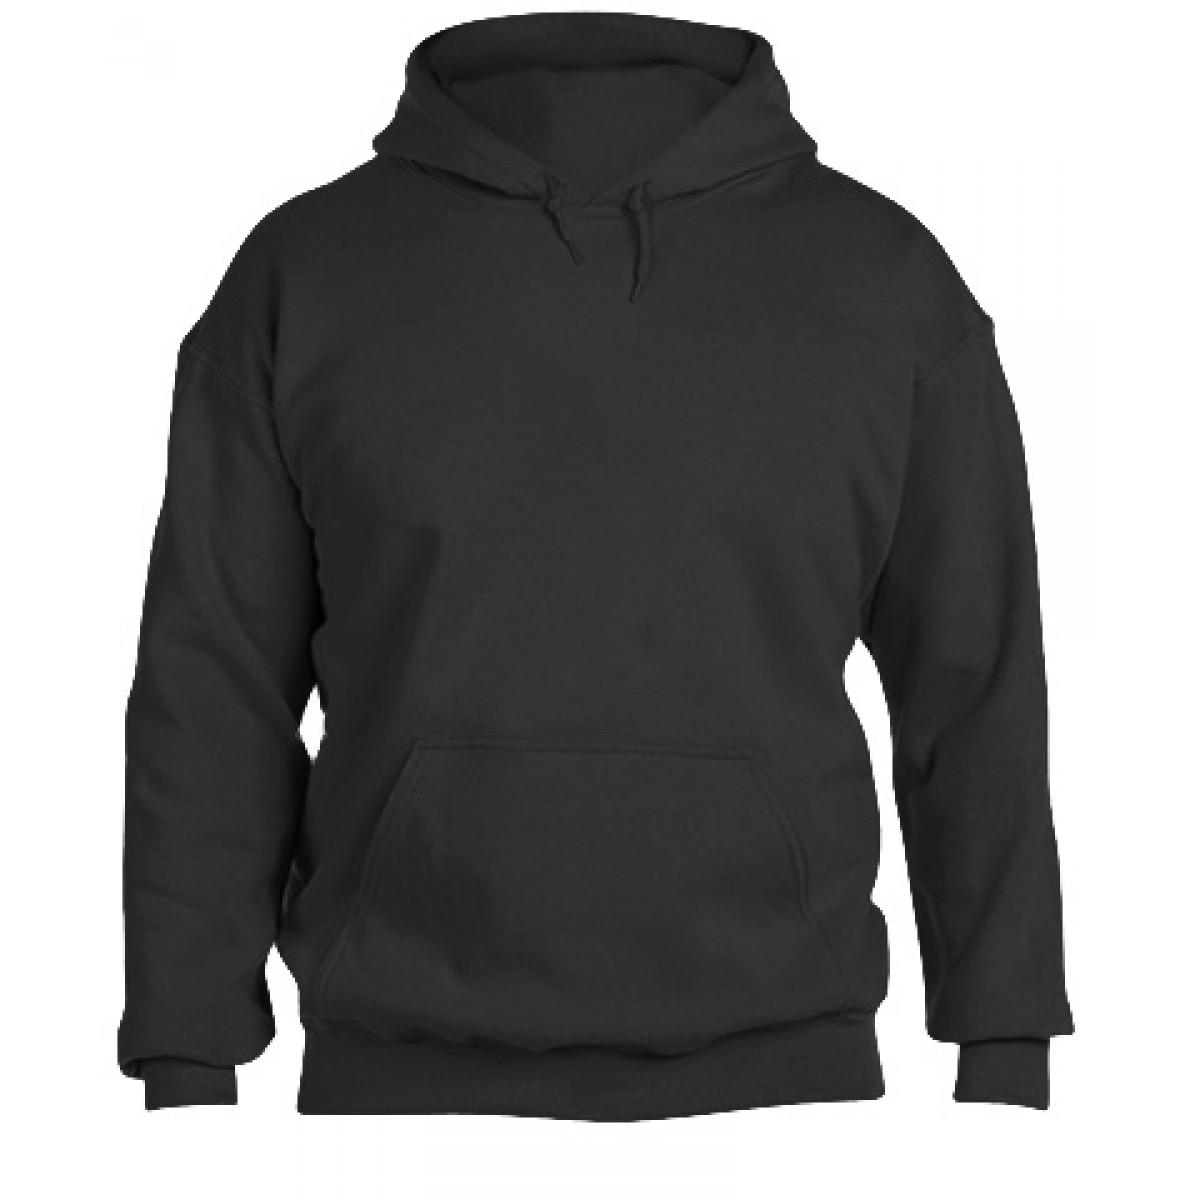 Solid Hooded Sweatshirt  50/50 Heavy Blend-Black-S